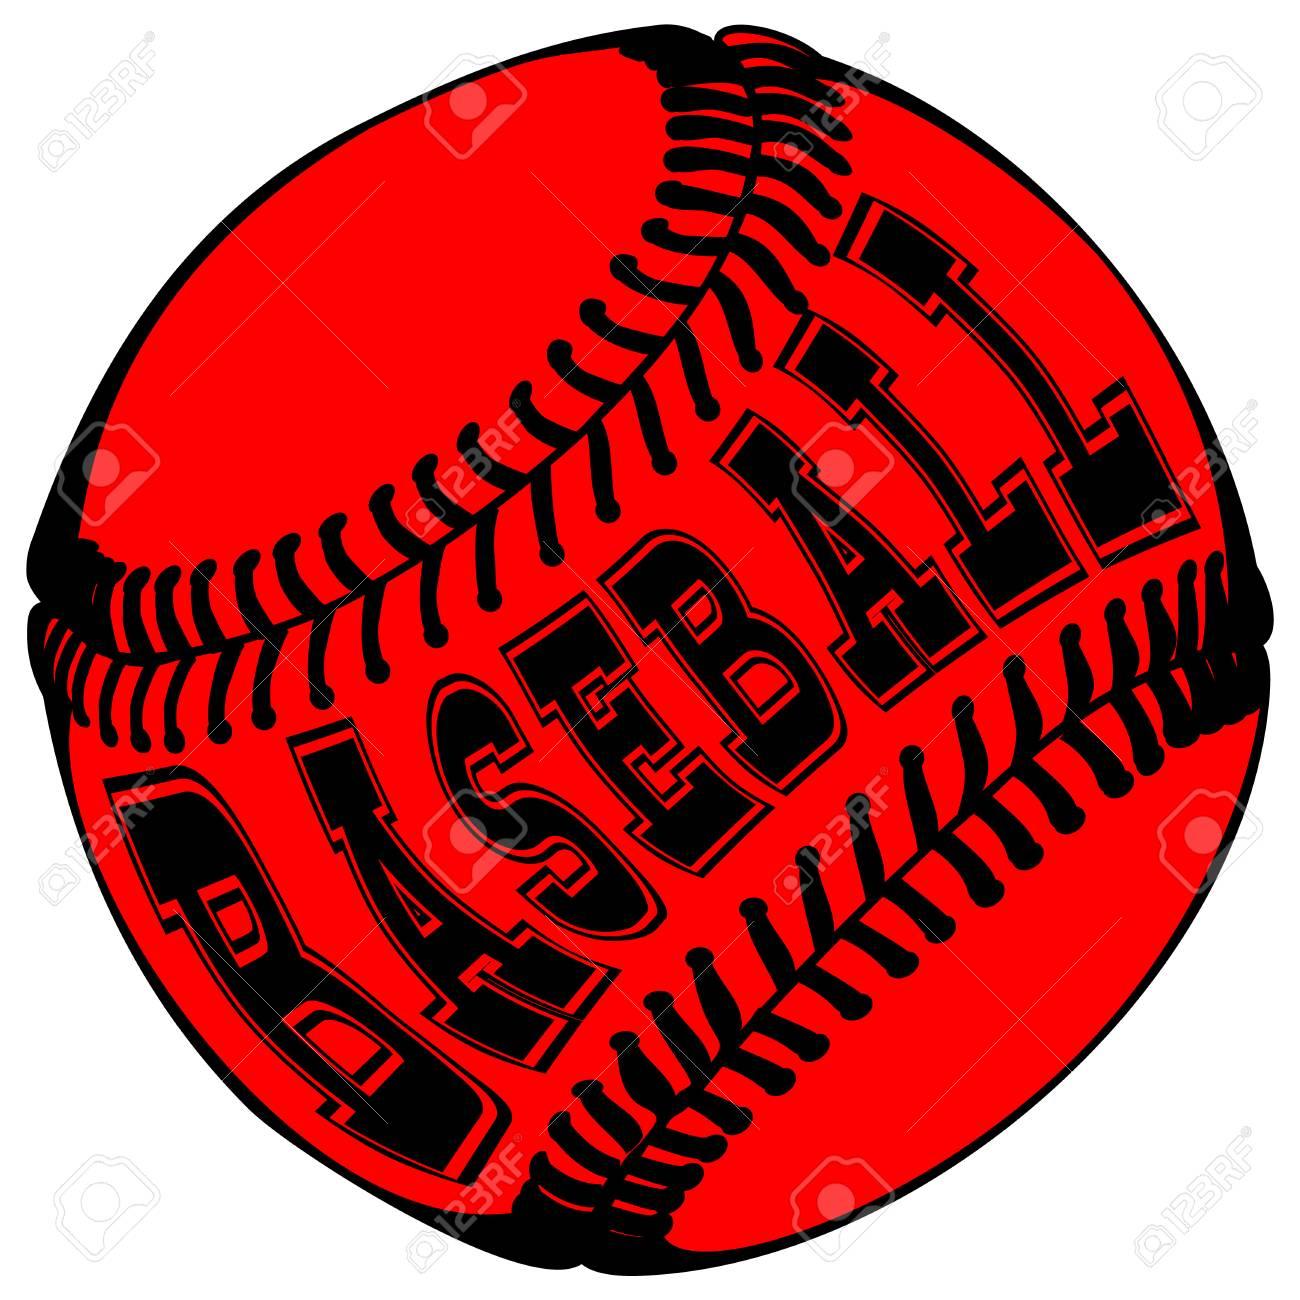 d8c5997c1795 Abstract vector illustration black and red baseball ball on white background.  Inscription baseball. Design